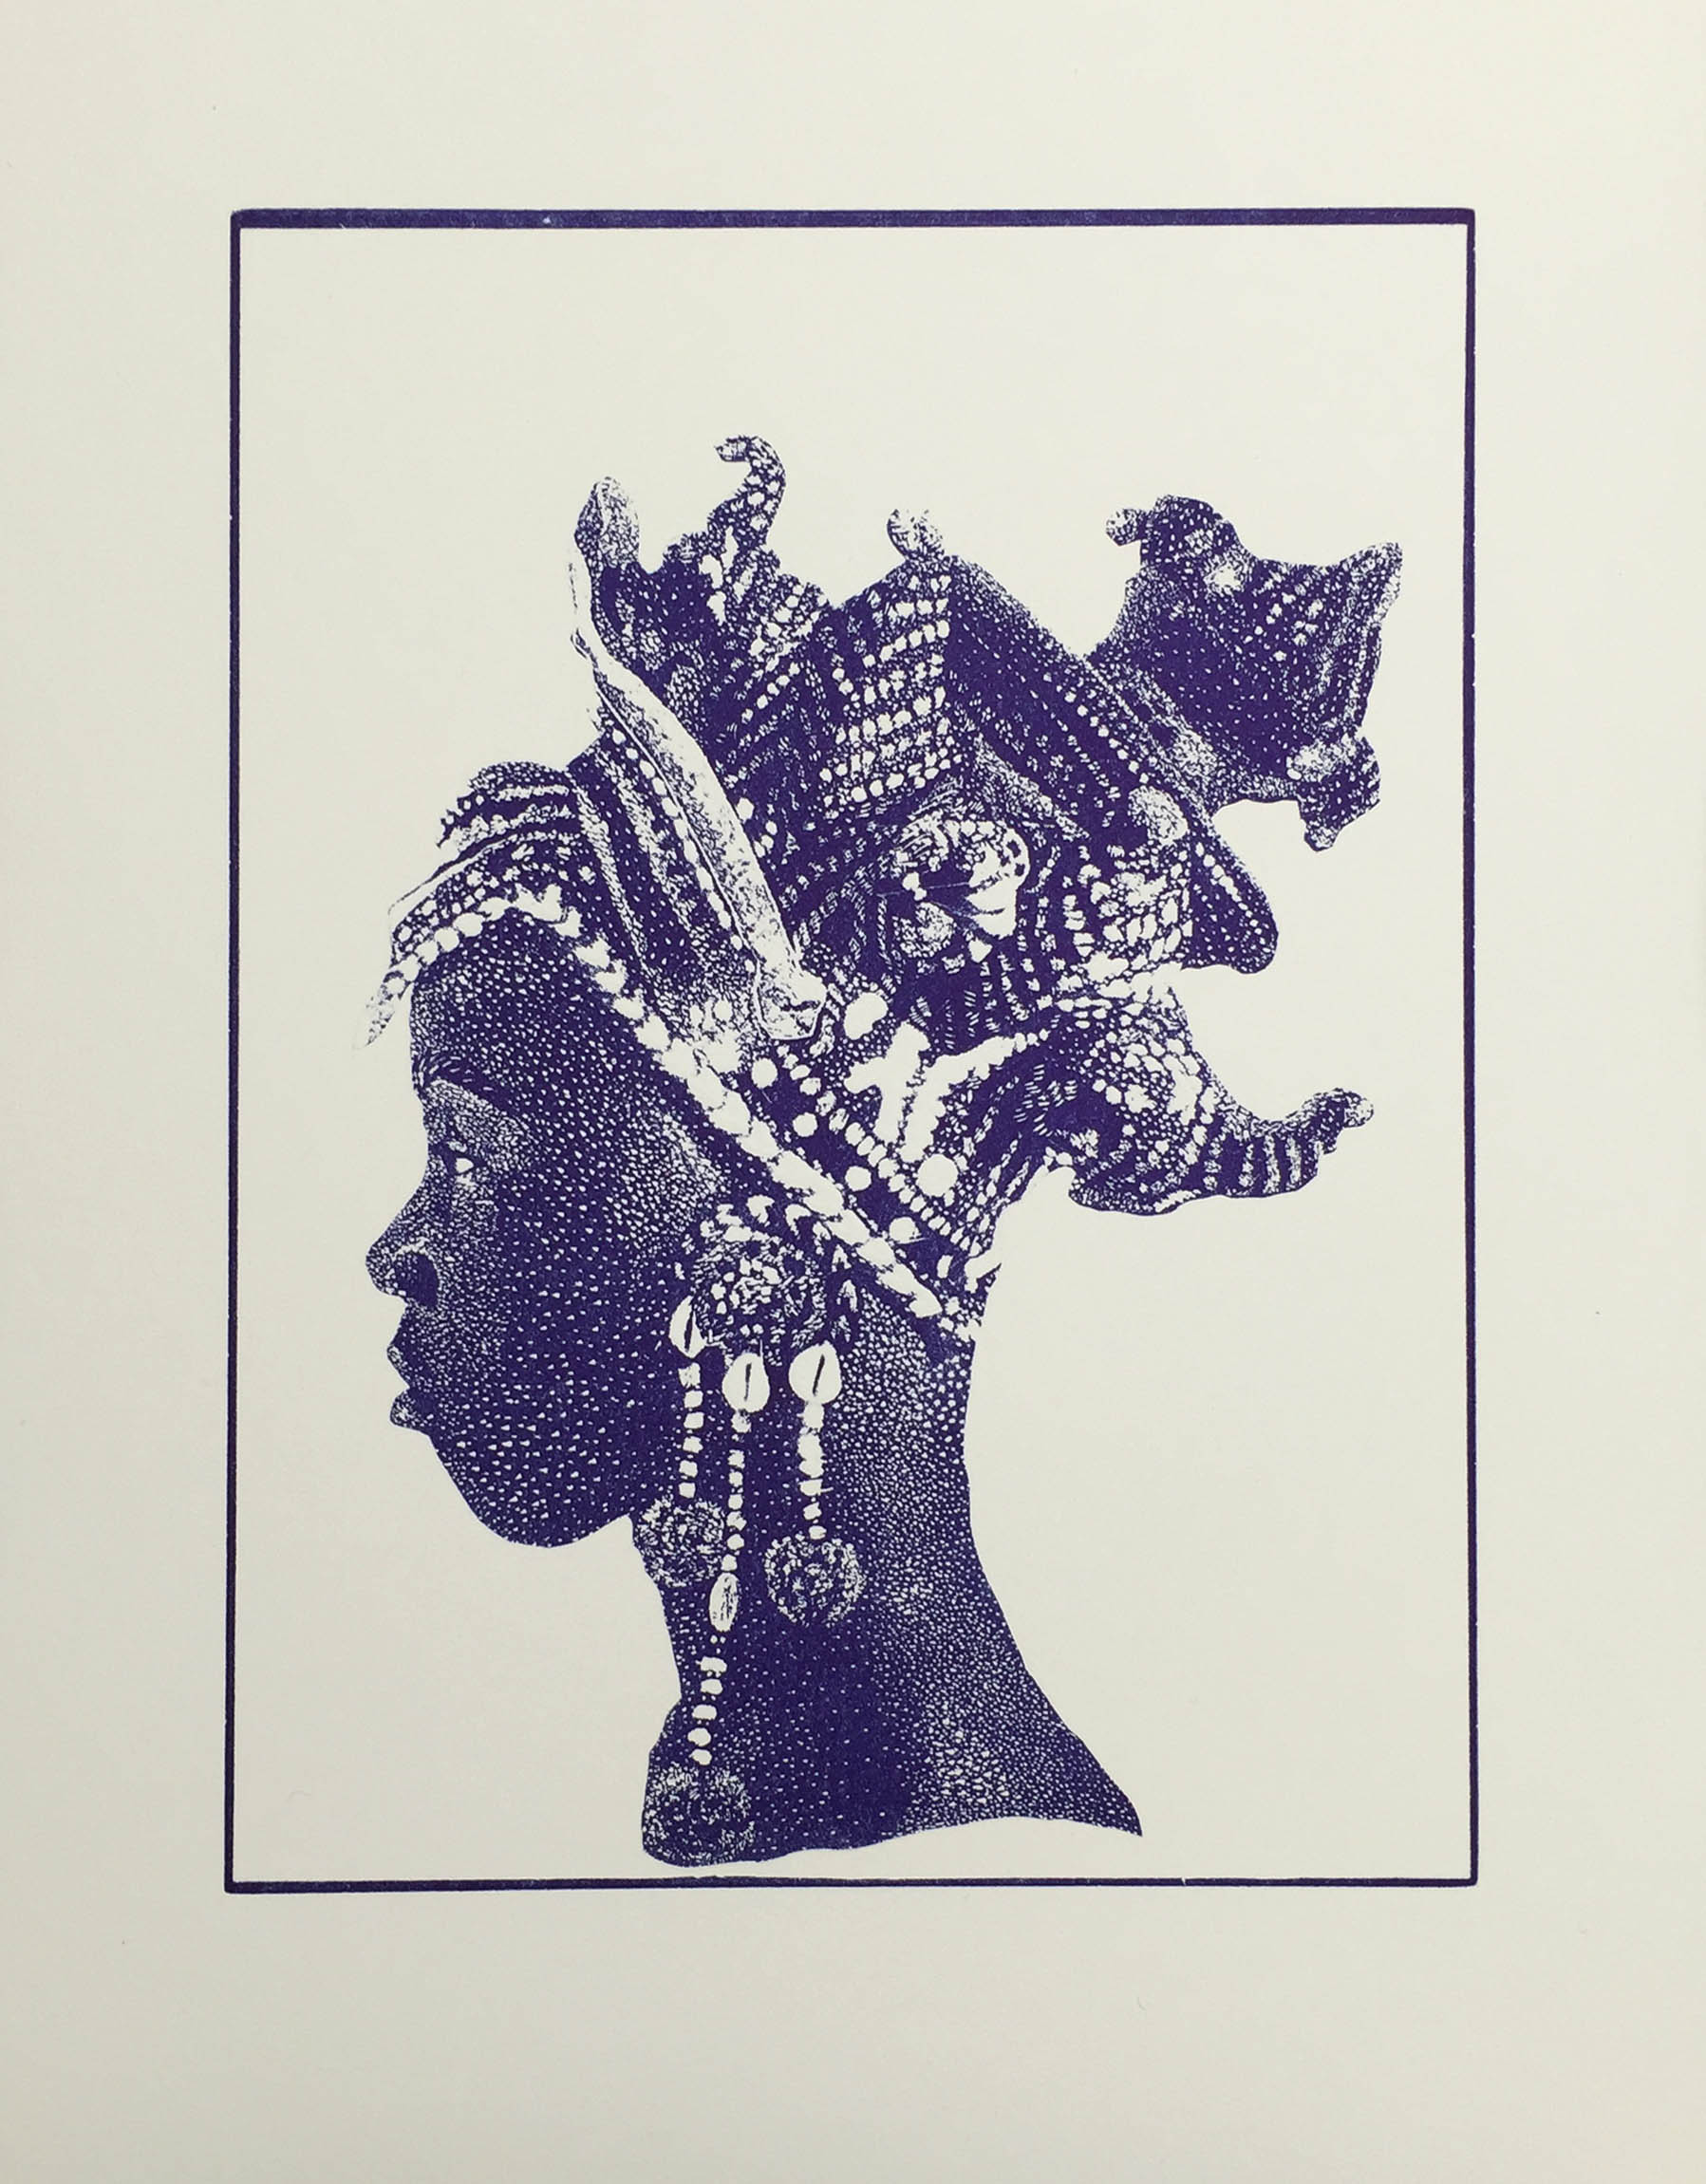 XENOBIA BAILEY